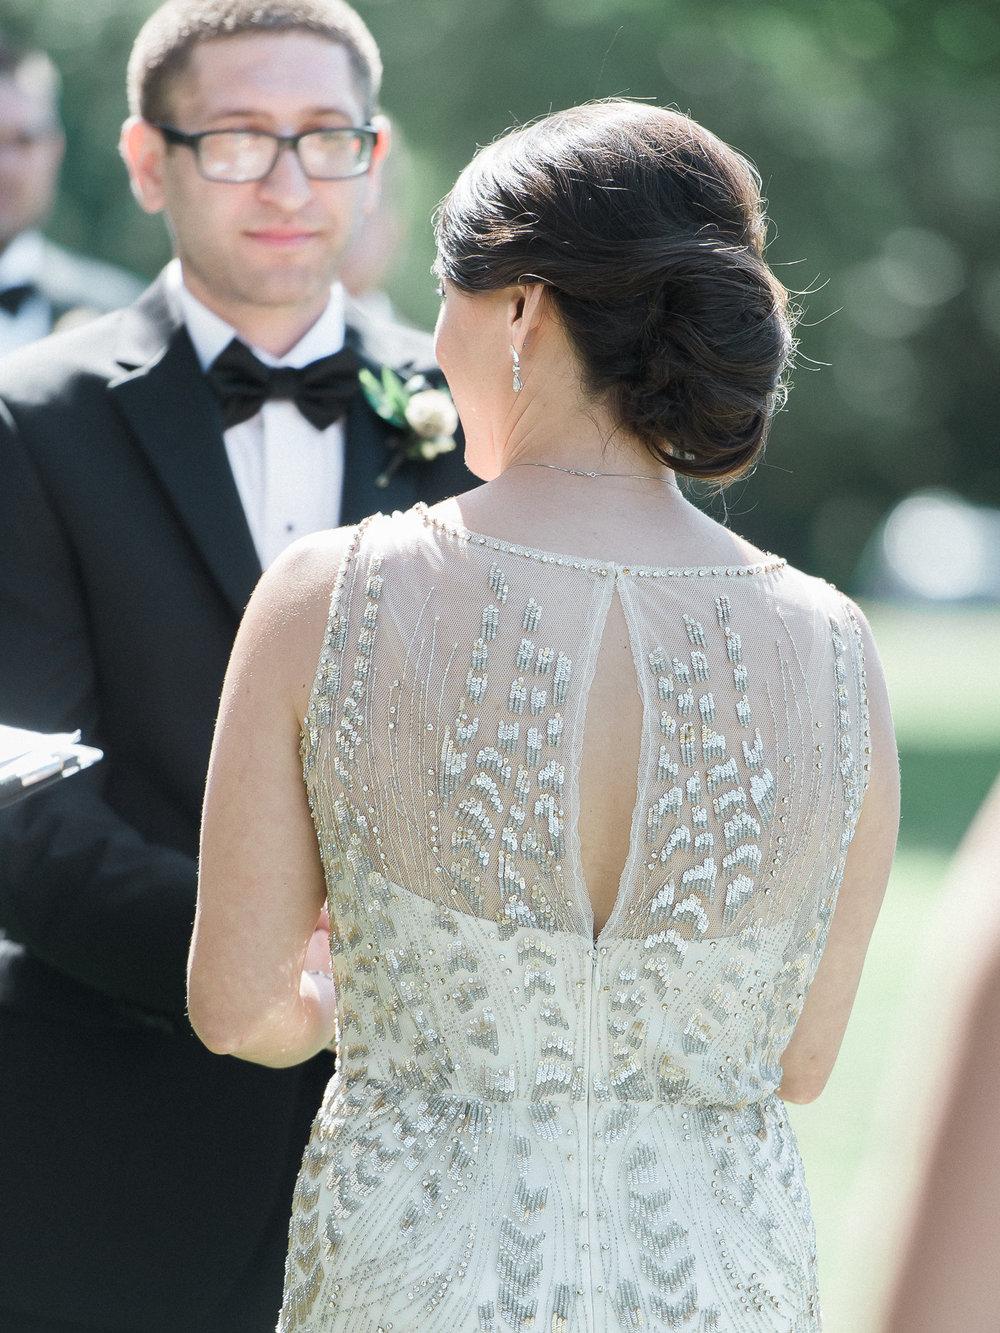 Sarah+Warren_wedding_spp-76.jpg